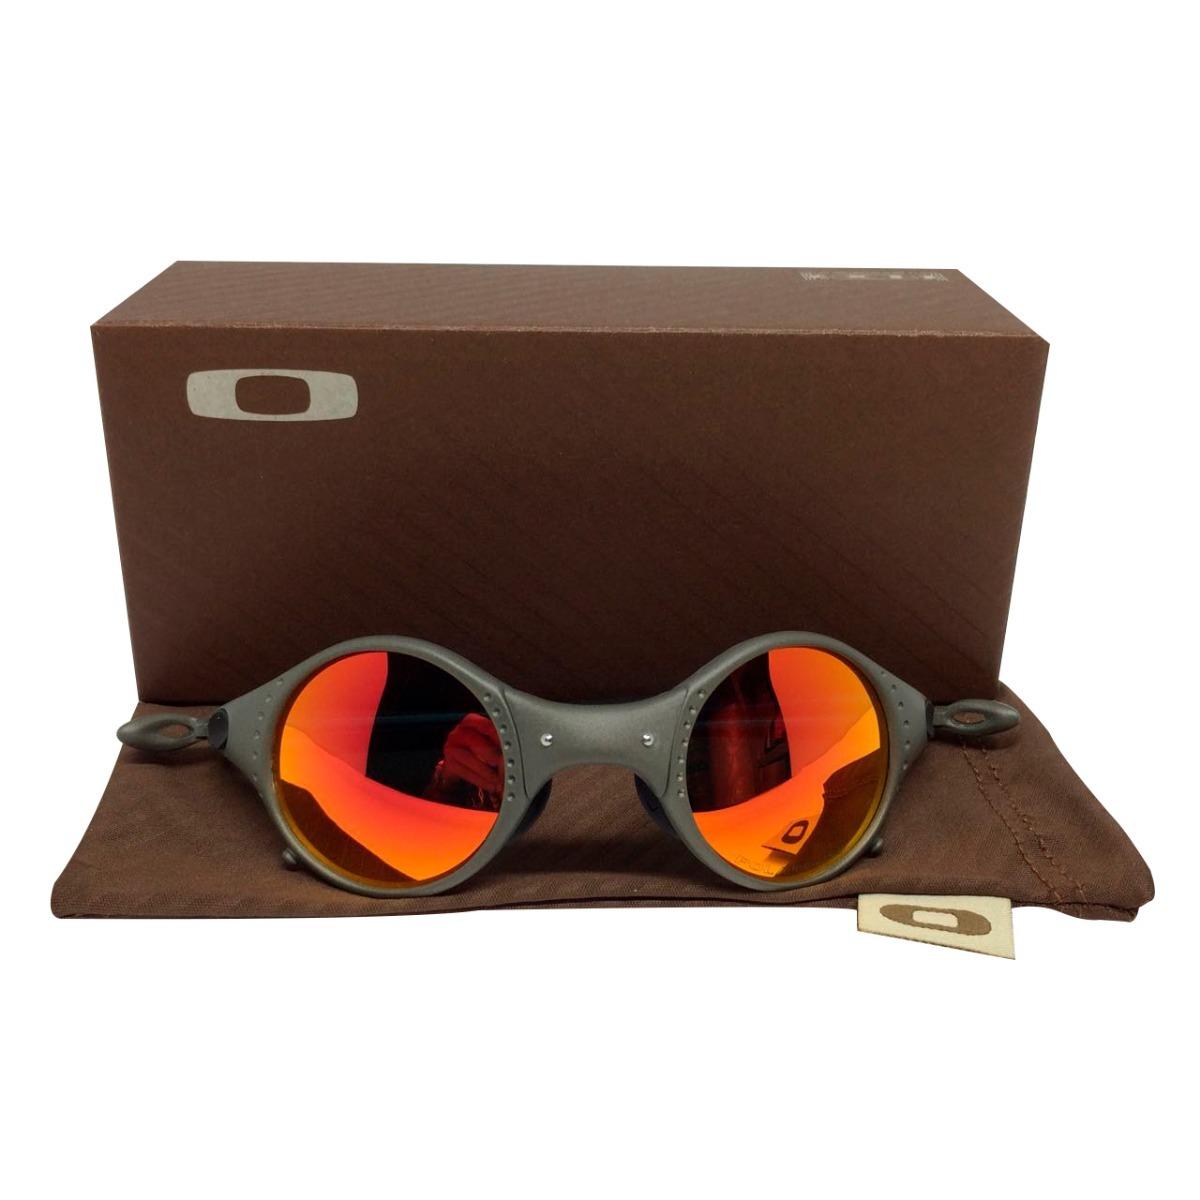 4d2a31a91 Óculos Juliet Mars X-metal Red Vermelho Original Co00-0319 - R$ 149 ...